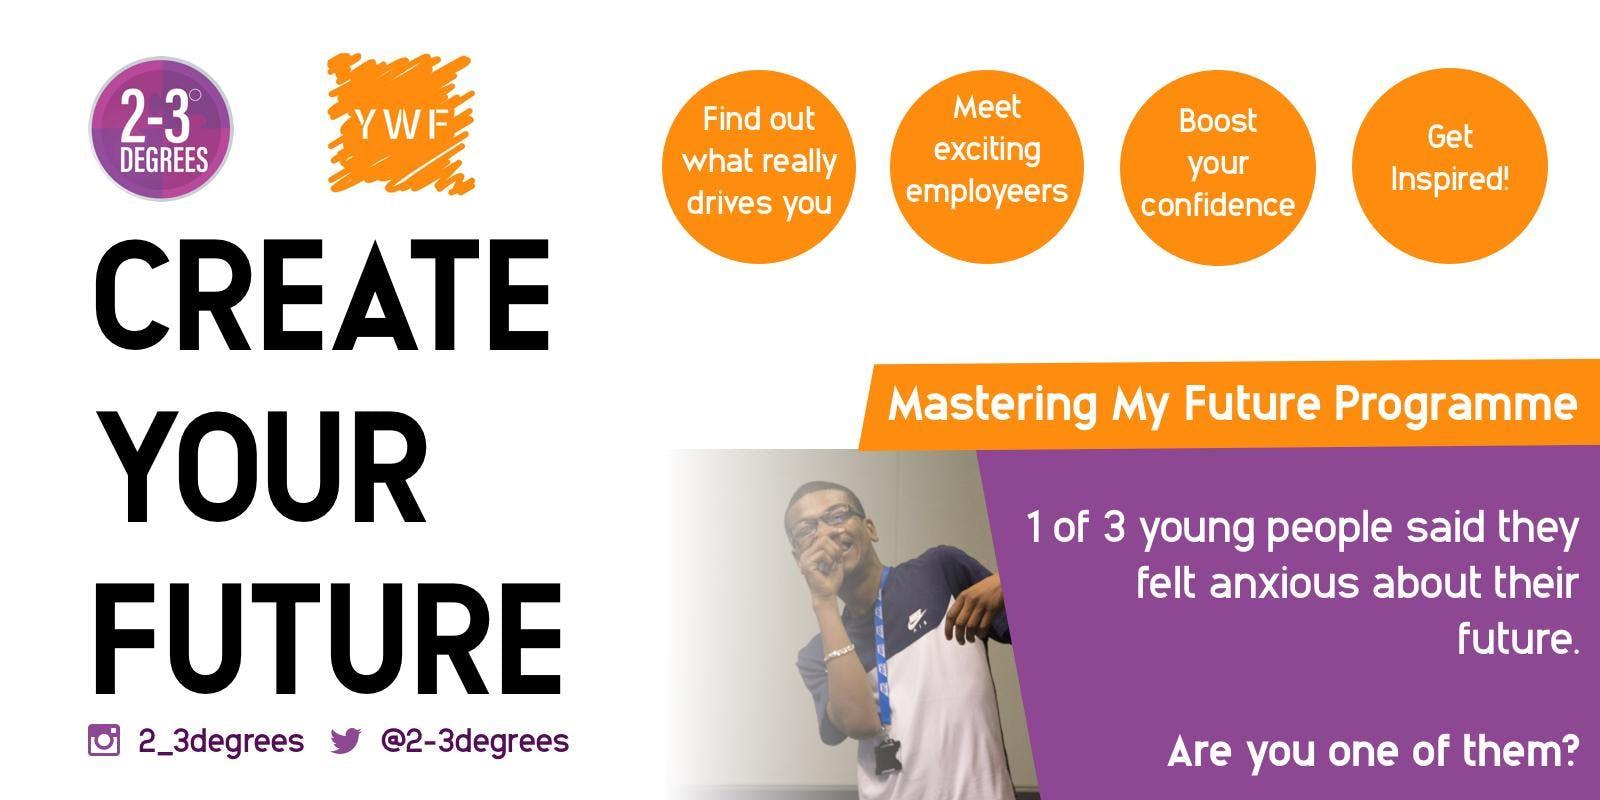 Mastering My Future Programme